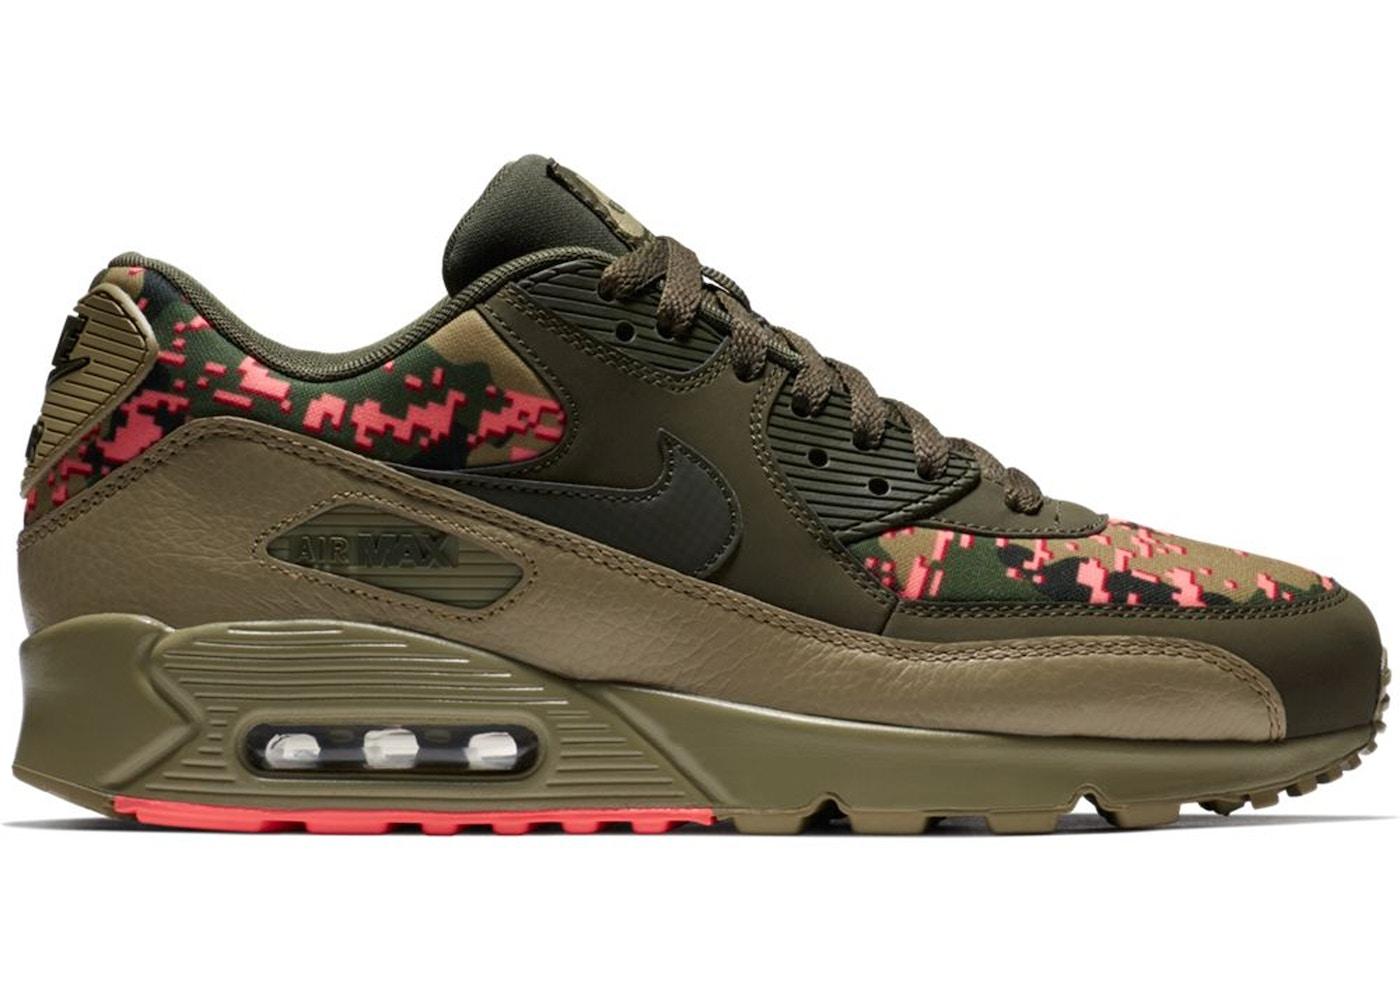 de094c1e920 Buy Nike Air Max 90 Shoes   Deadstock Sneakers